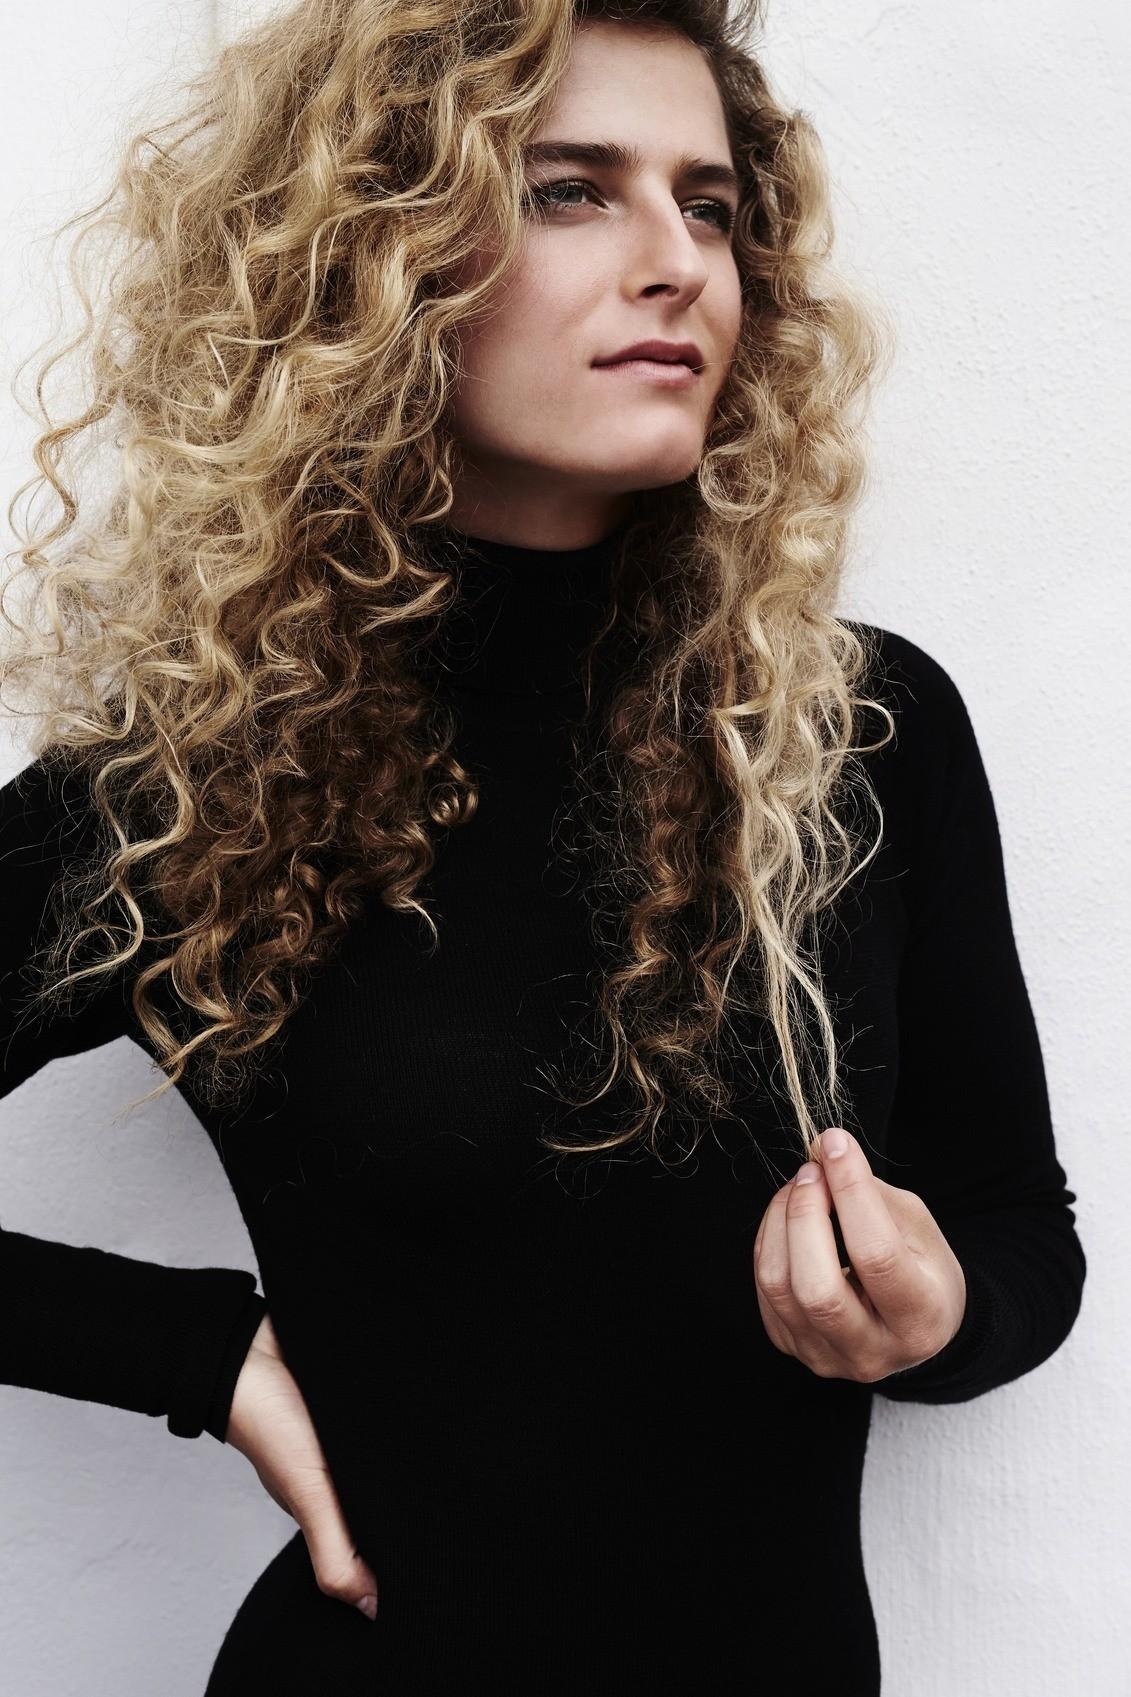 Balayage on curly hair: long, curly hair